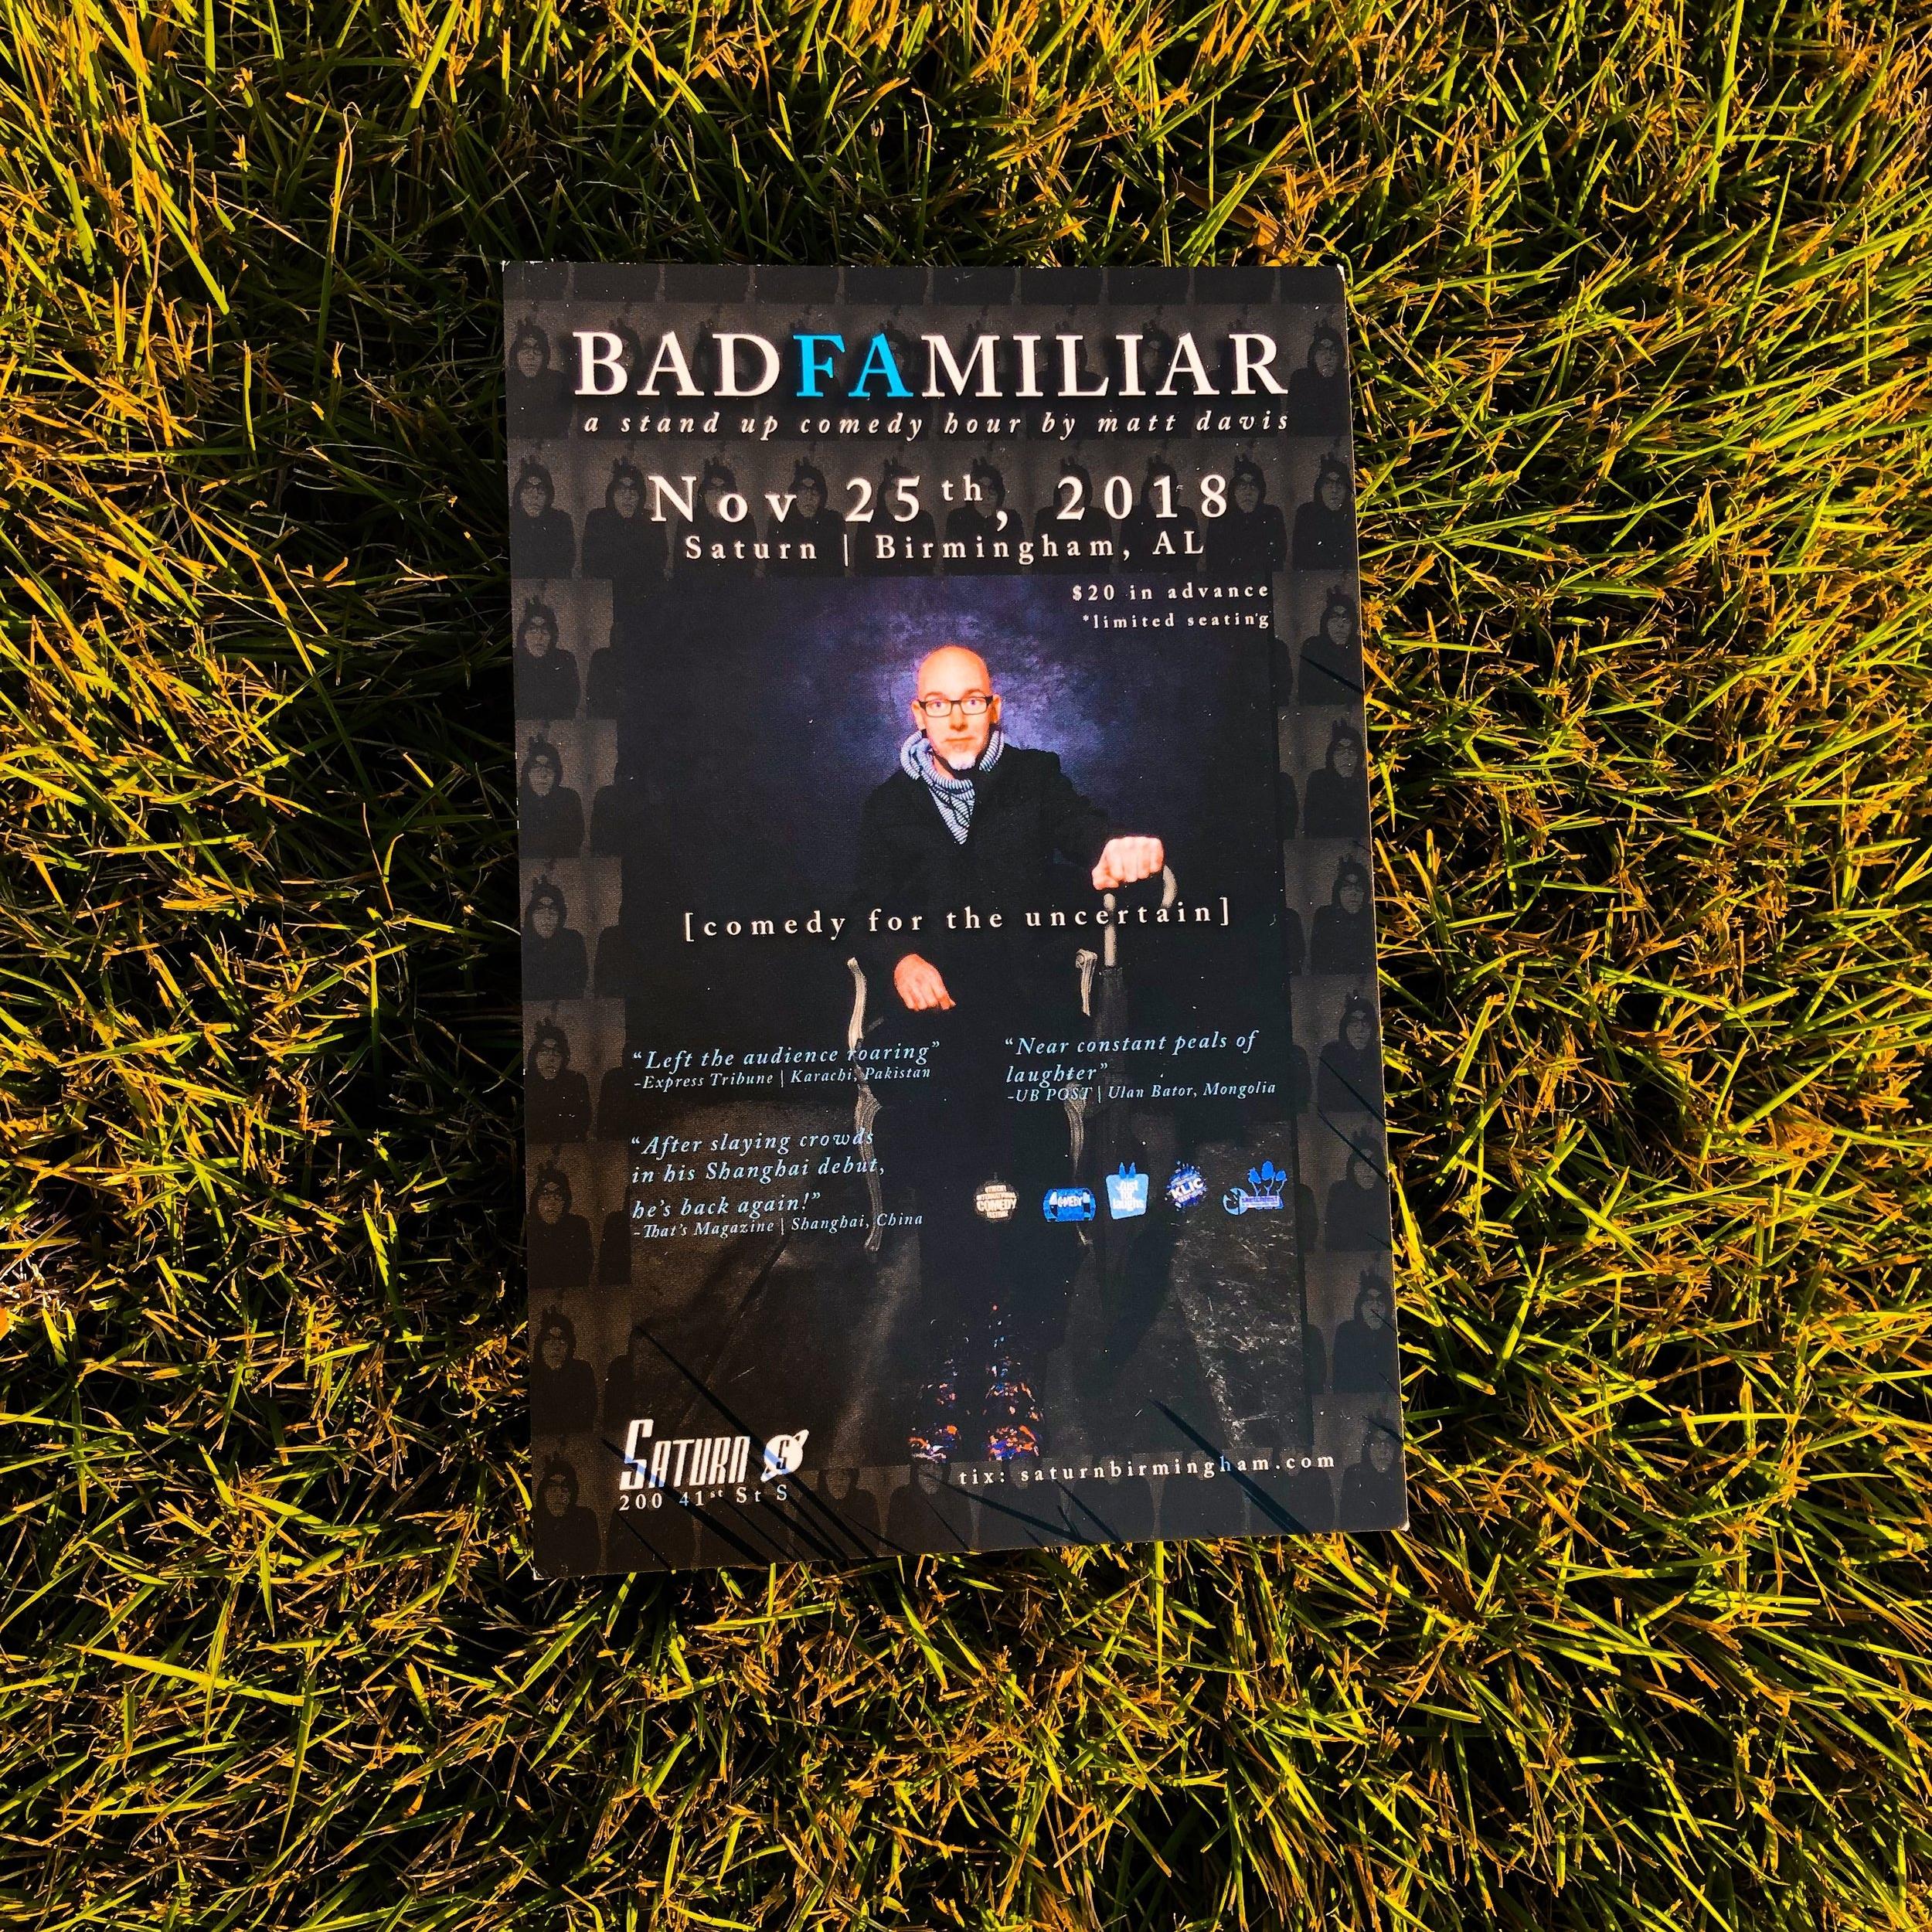 Matt Davis' BadFamiliar: Live - comedy for the uncertain